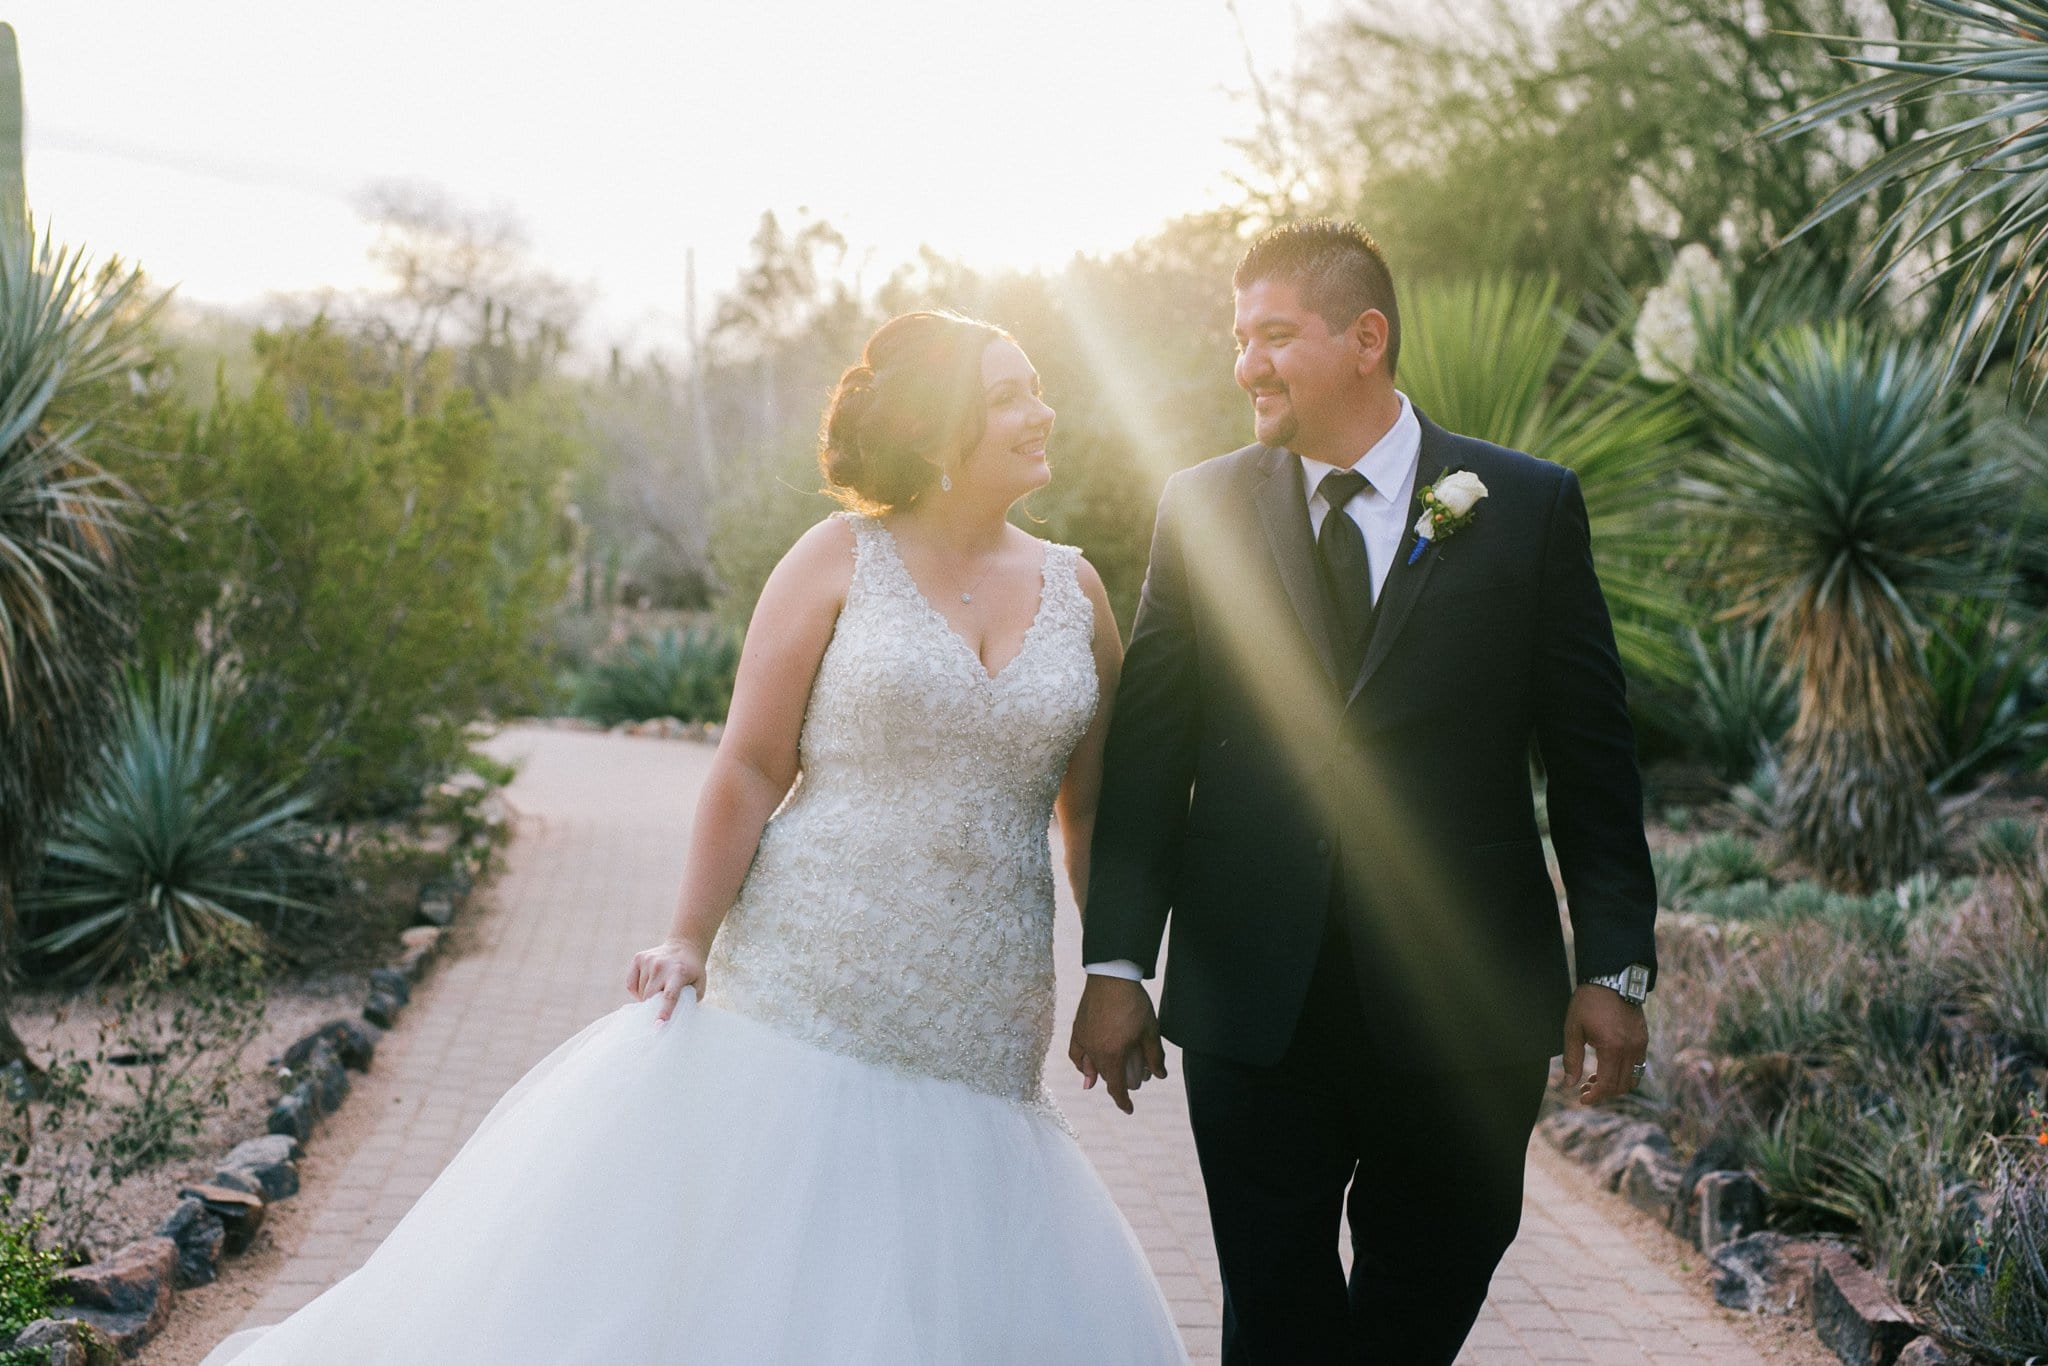 bride & groom at Desert Botanical Garden wedding